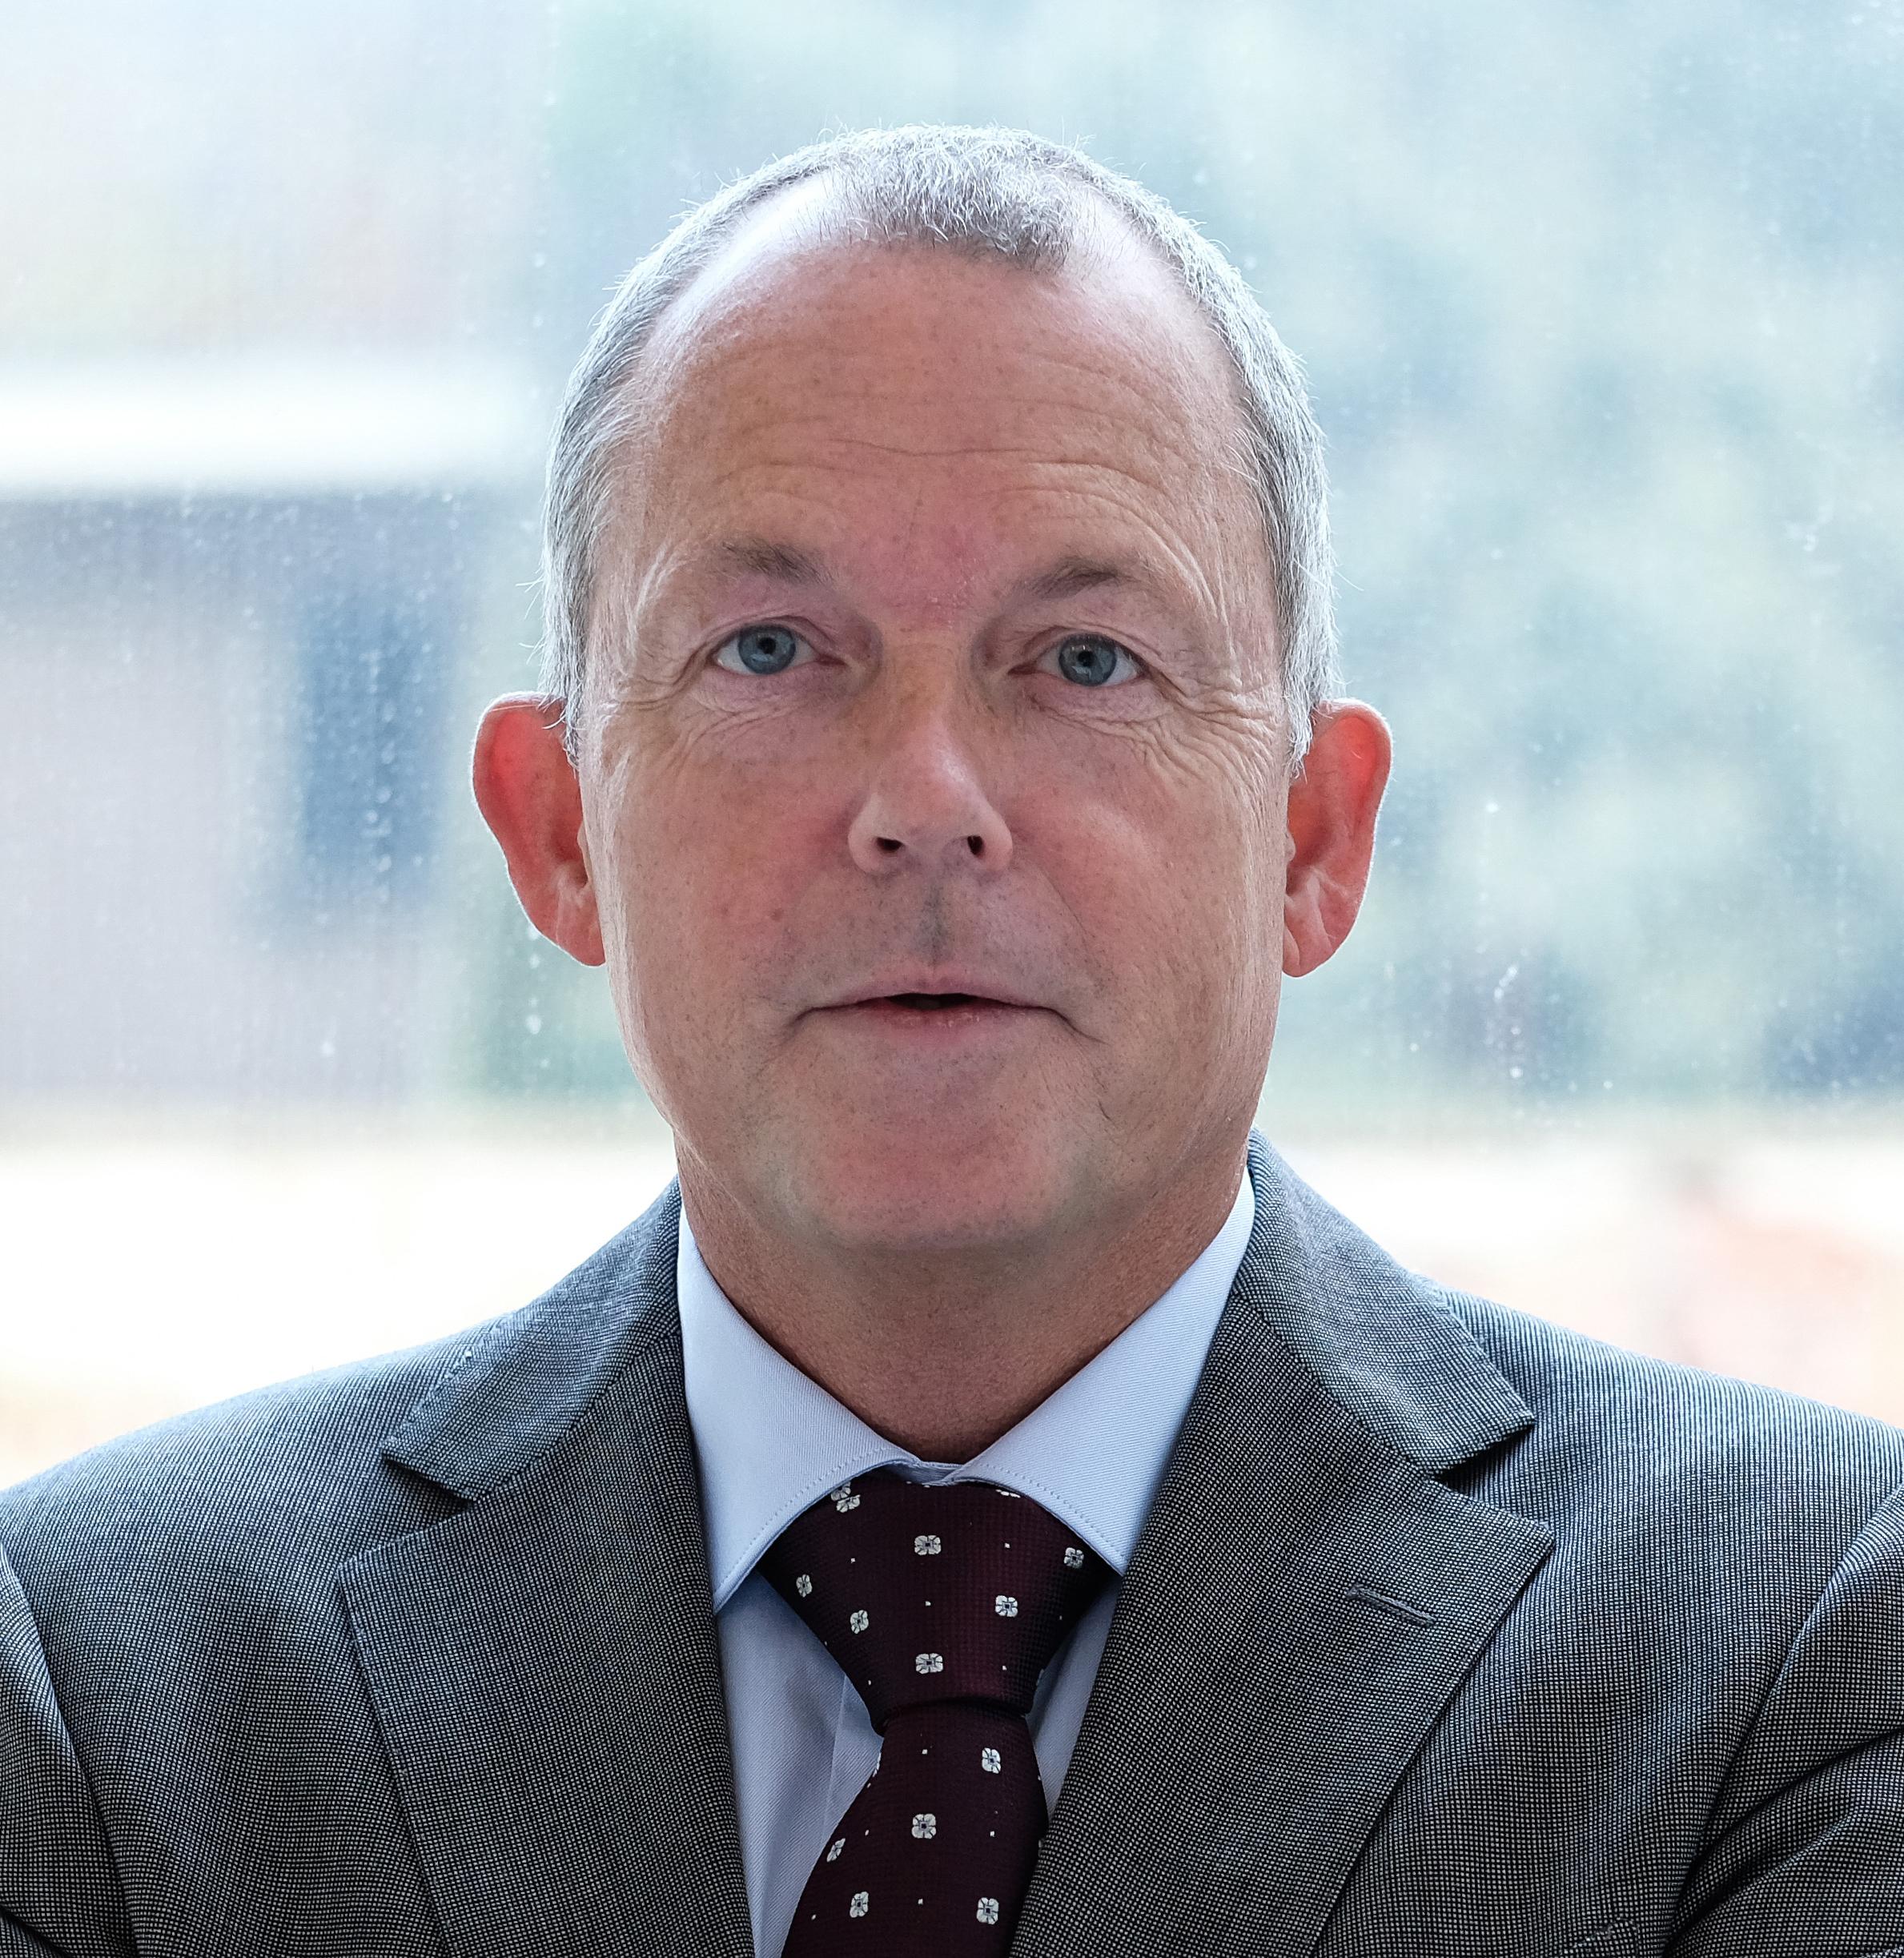 Marco Bruines - CEO Leyard EMEA (Photo: Business Wire)